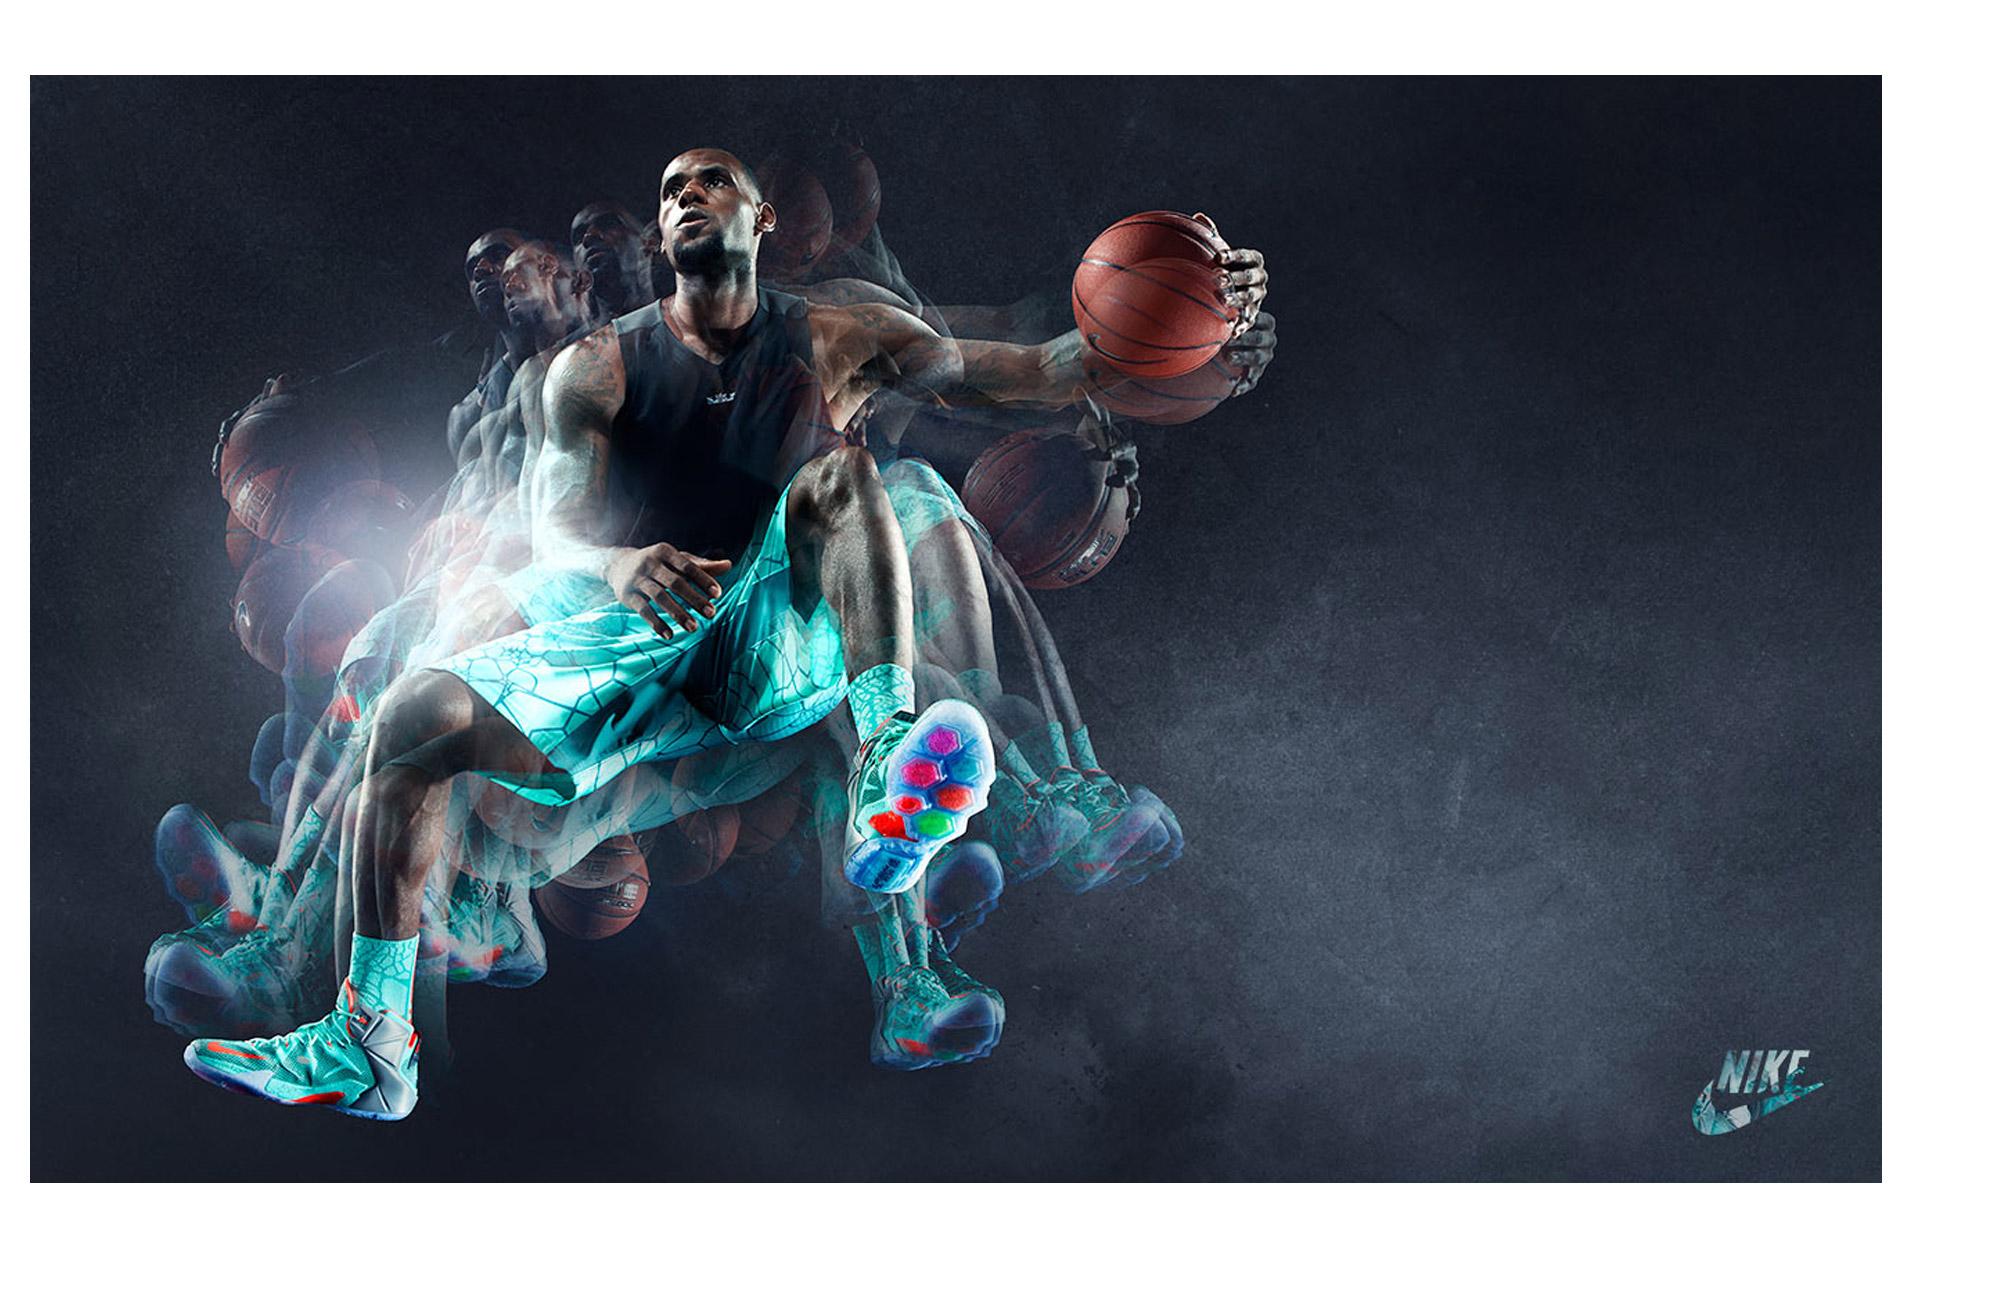 Nike Zoom - 1 of 2